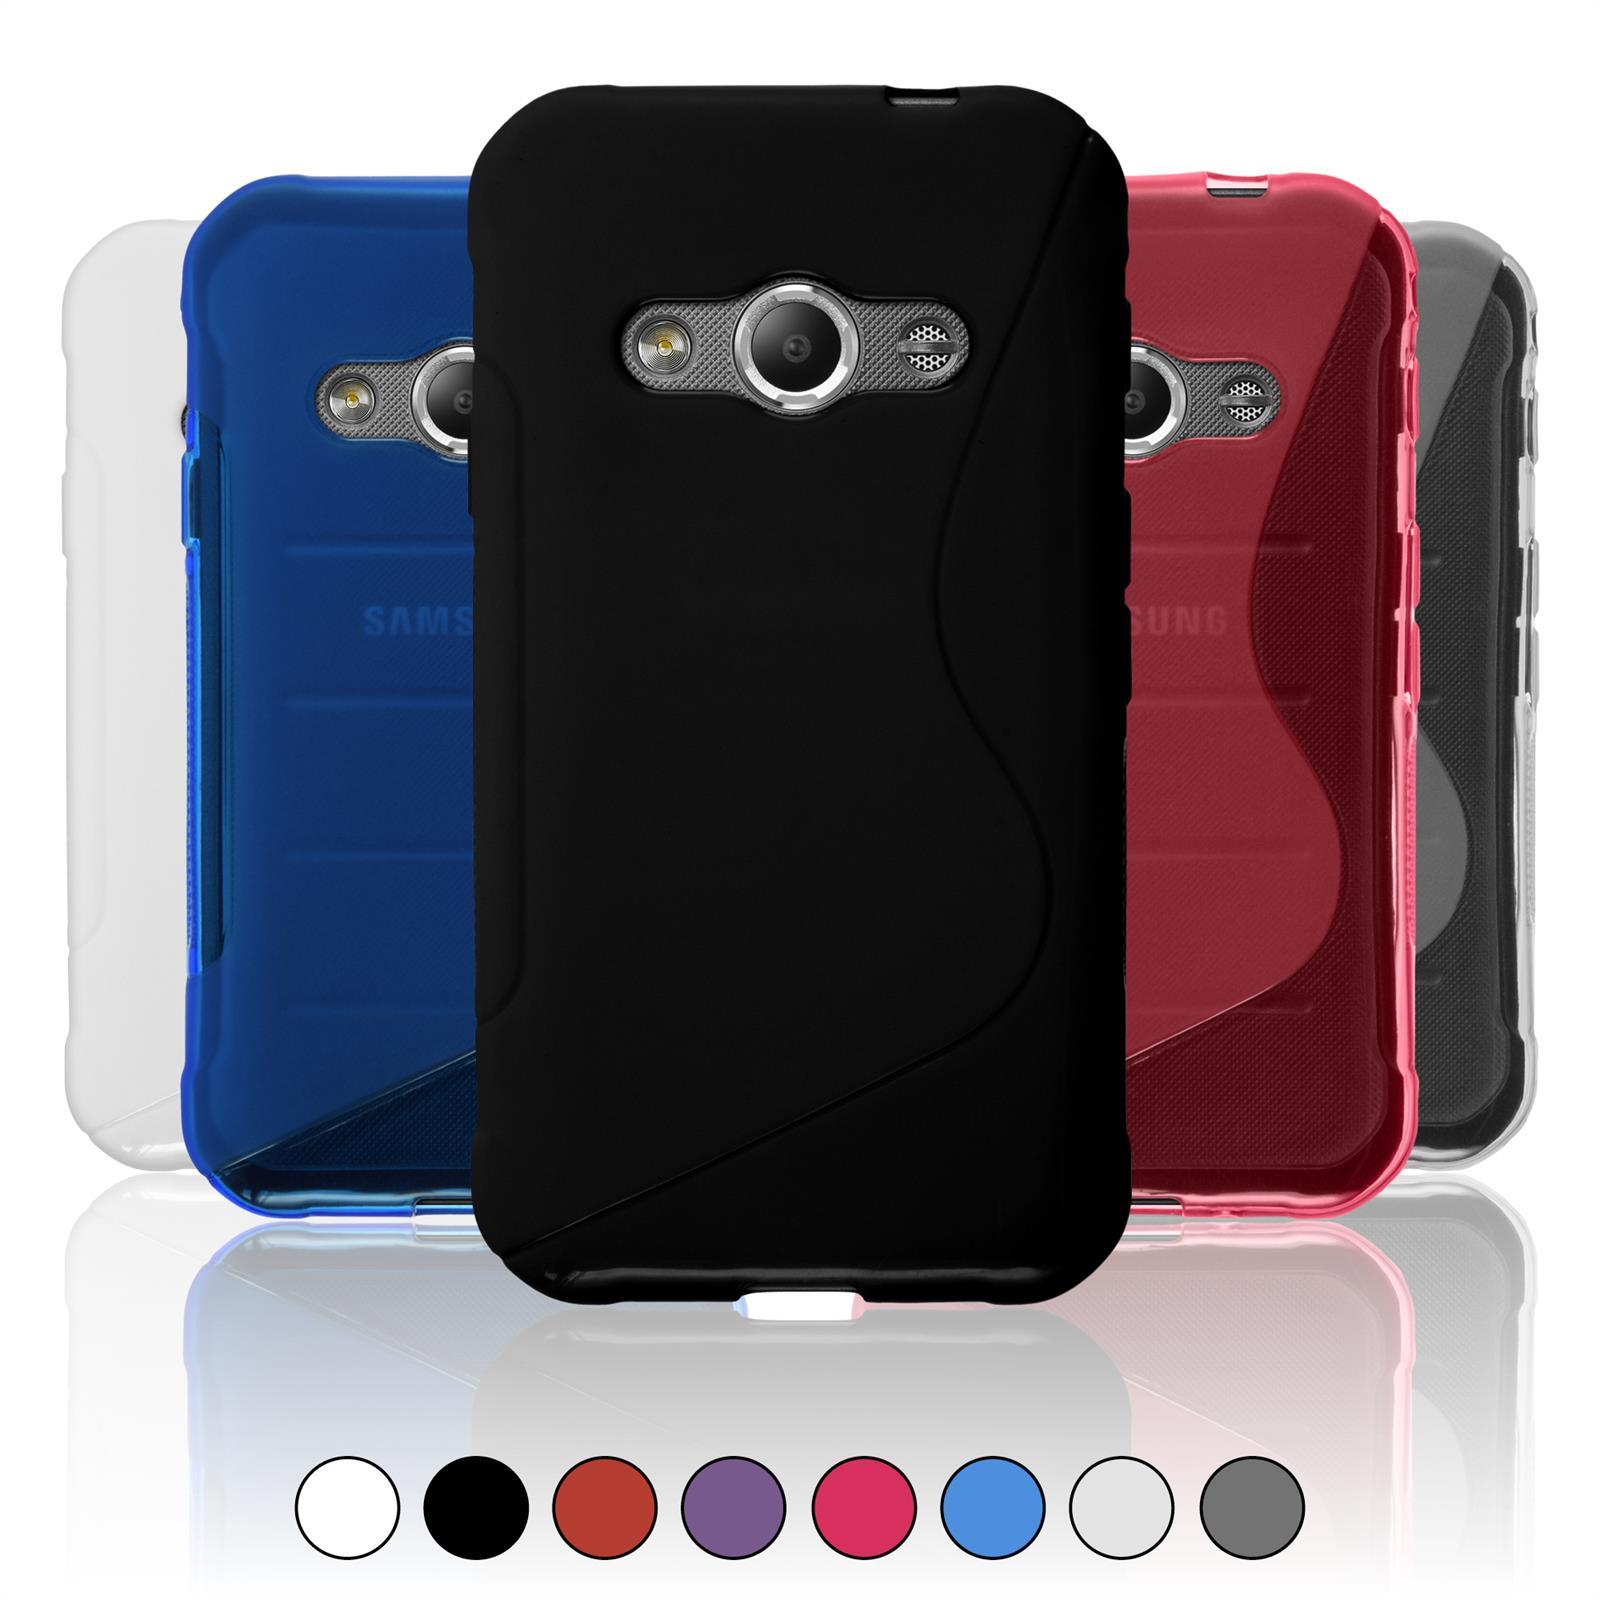 Premium Soft Silicone Gel Skin Case Cover for Samsung